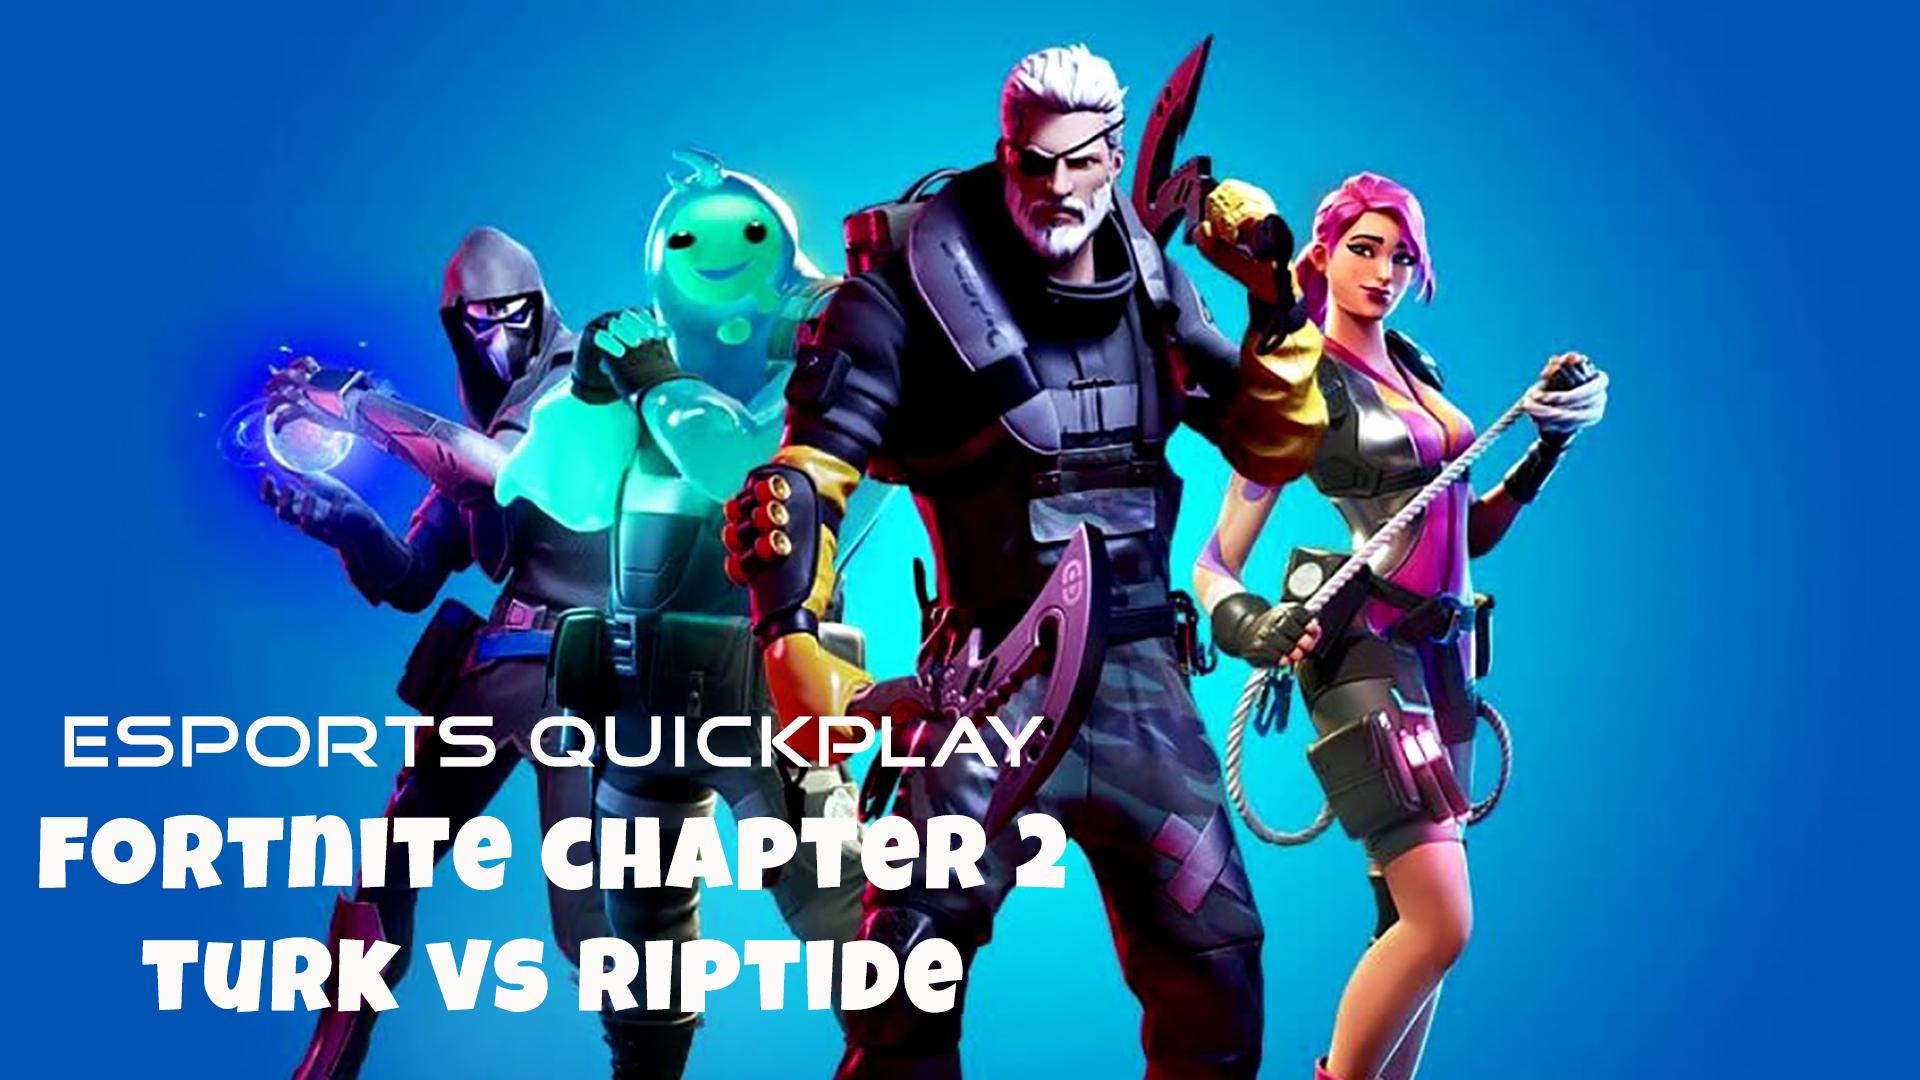 Amazon Com Watch Esports Quickplay Fortnite Chapter 2 Cameo Vs